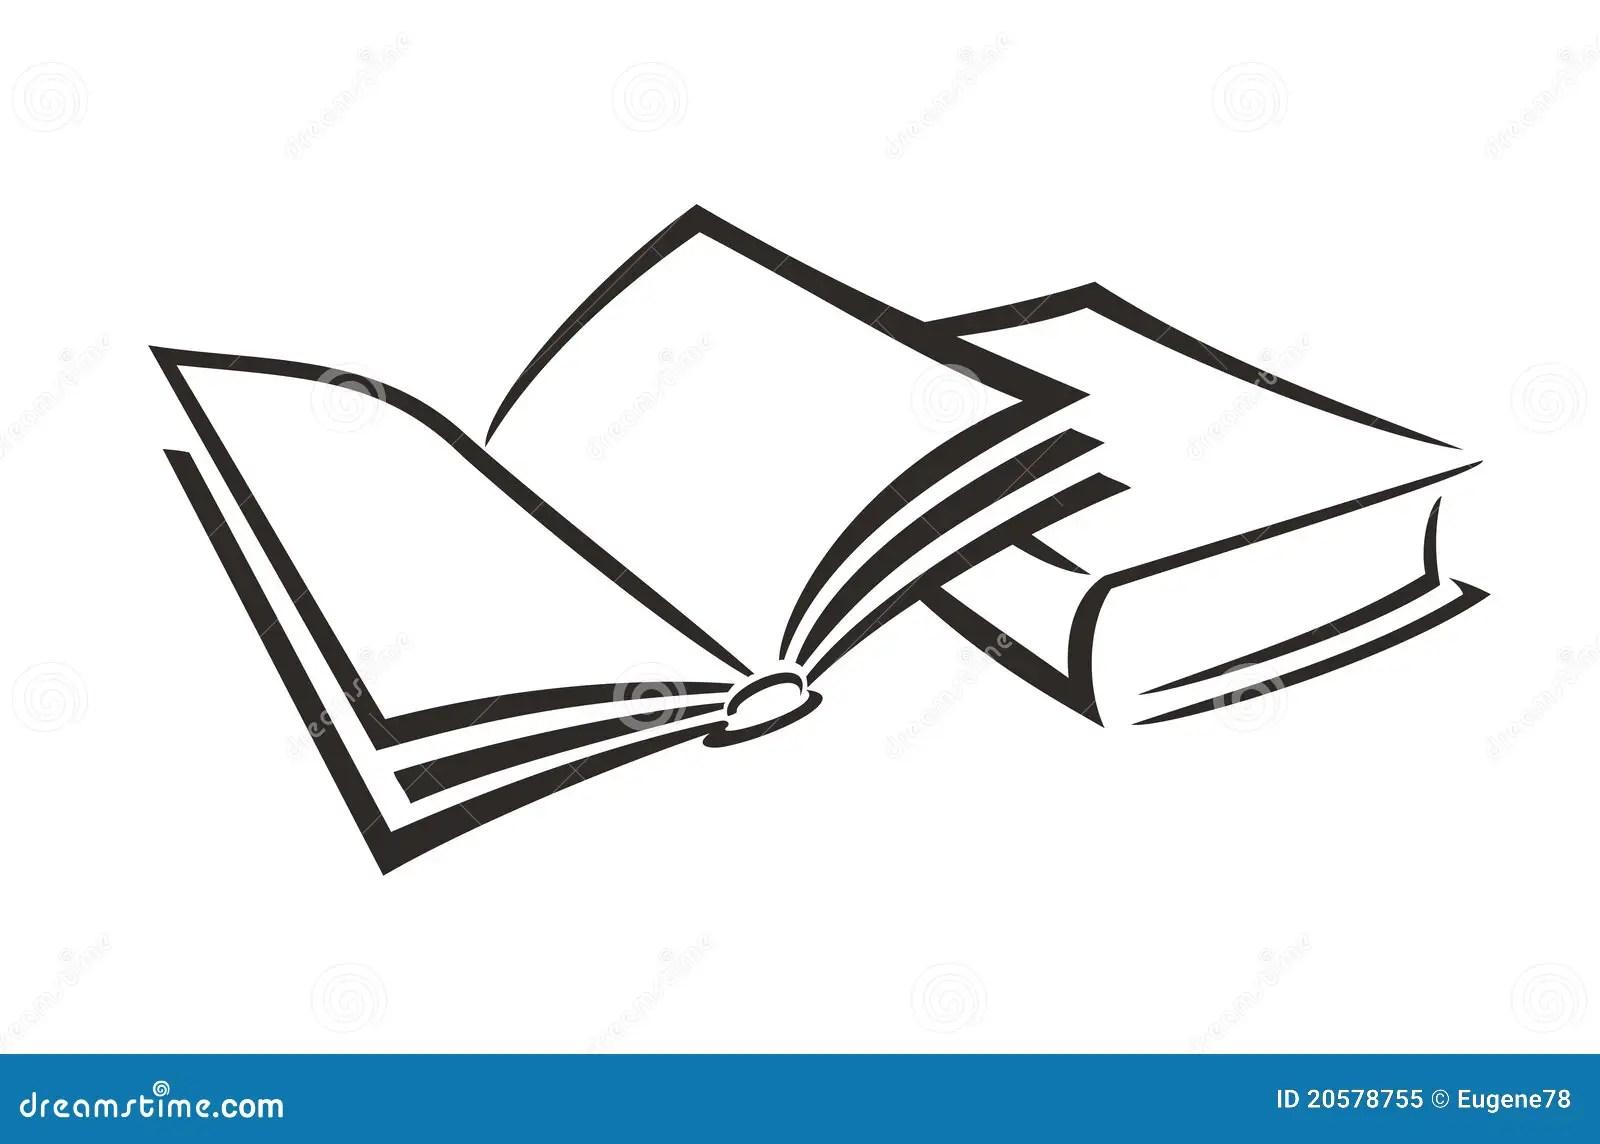 Book open stock vector. Illustration of legal, thesaurus